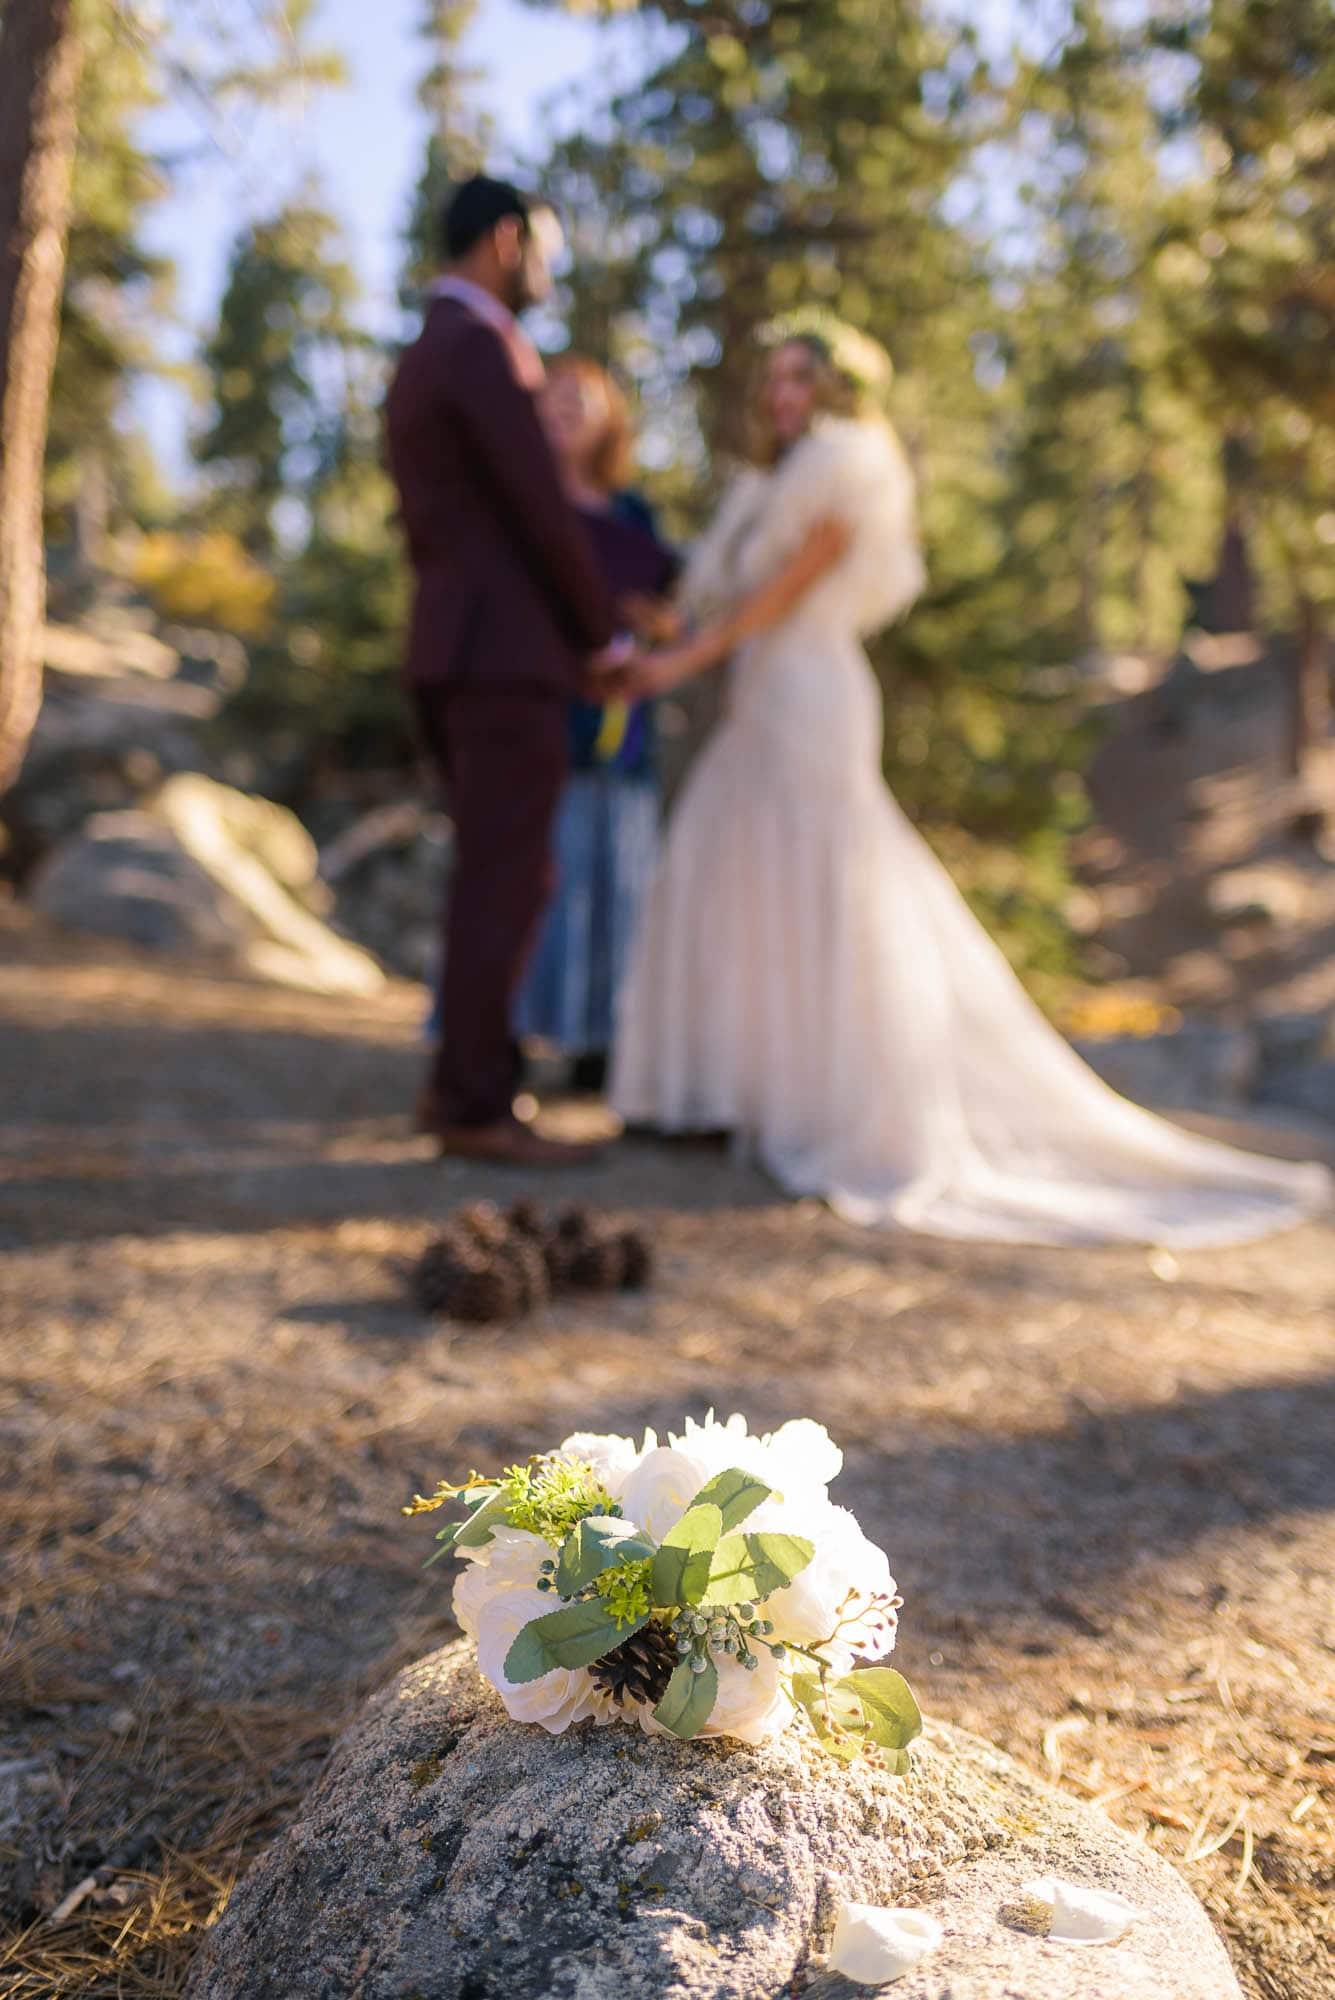 017_Alan_and_Heidi_Wedding_Natalie_Mike